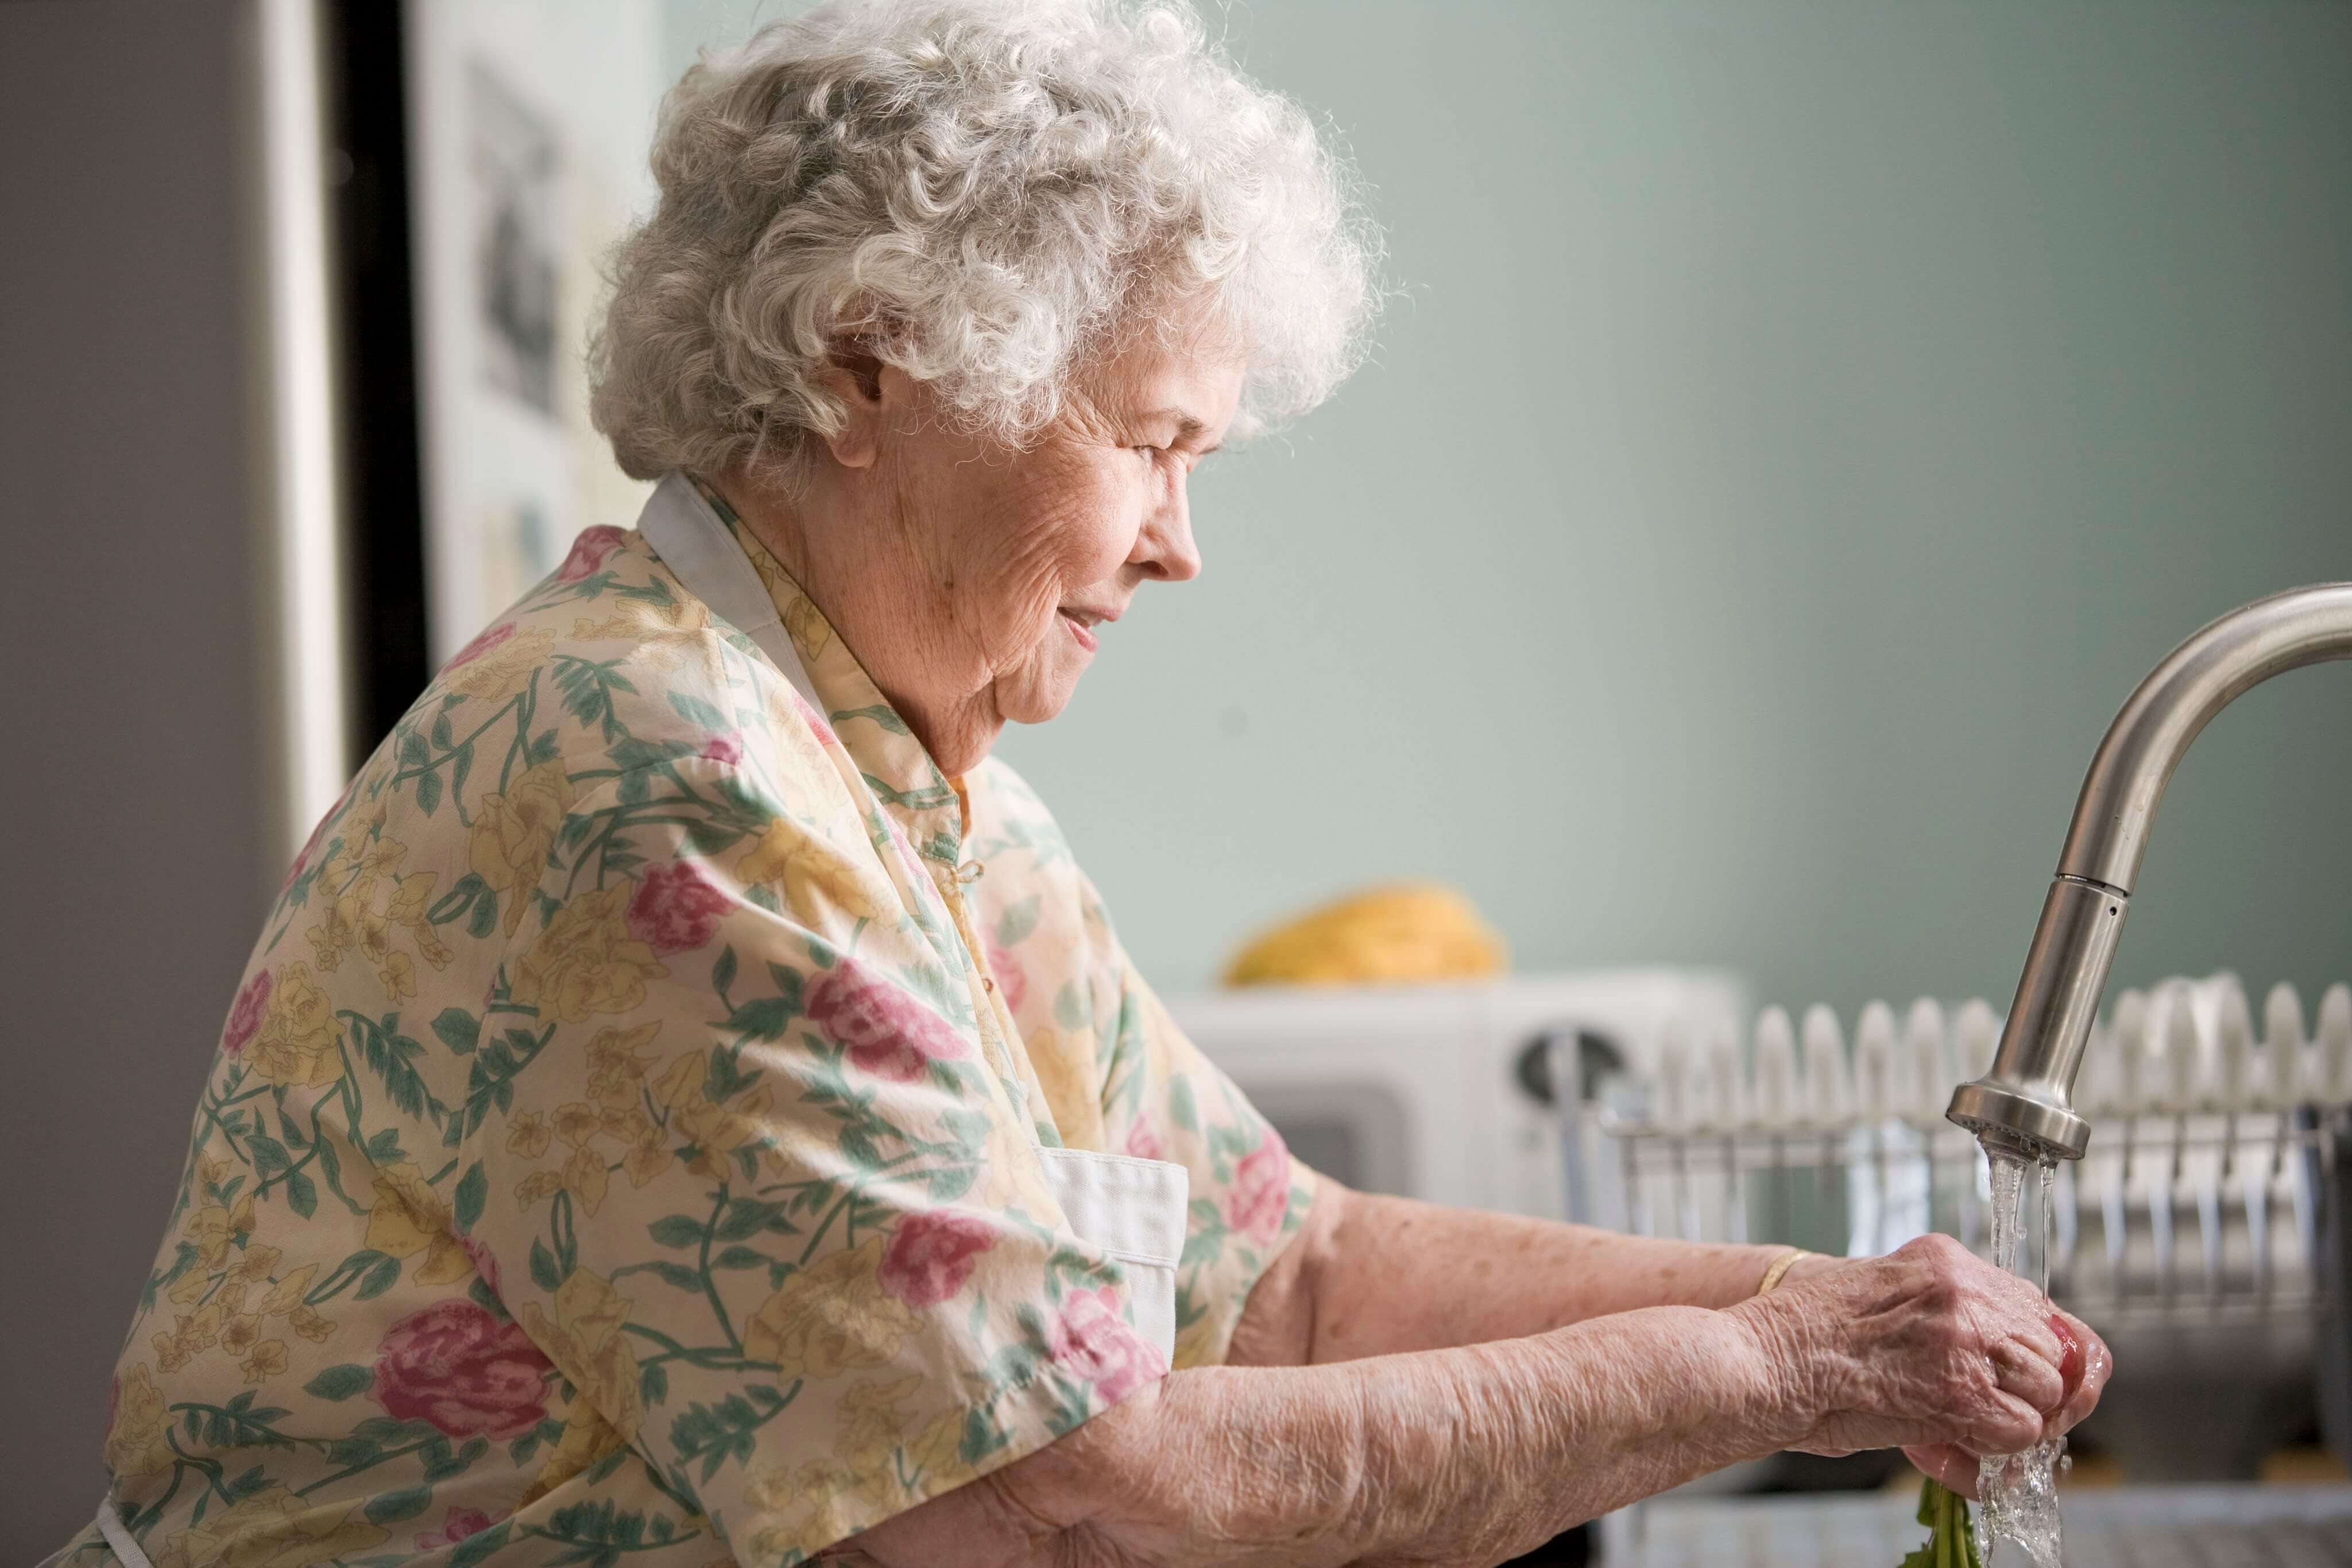 Senior woman washing her hands at the kitchen sink